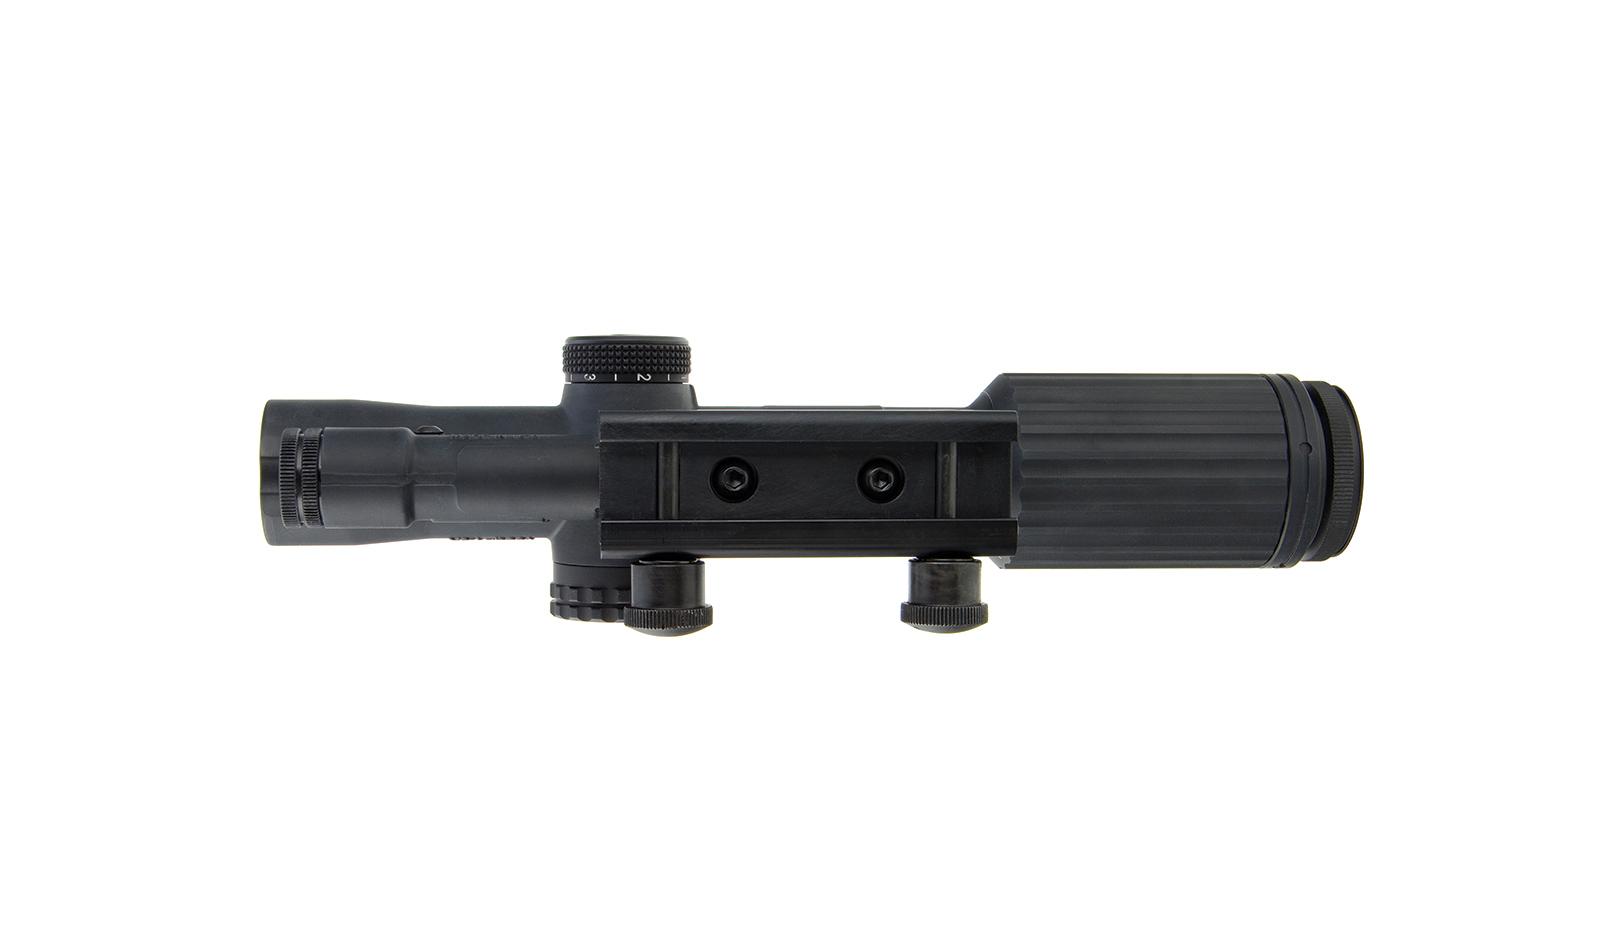 VC16-C-1600003 angle 10